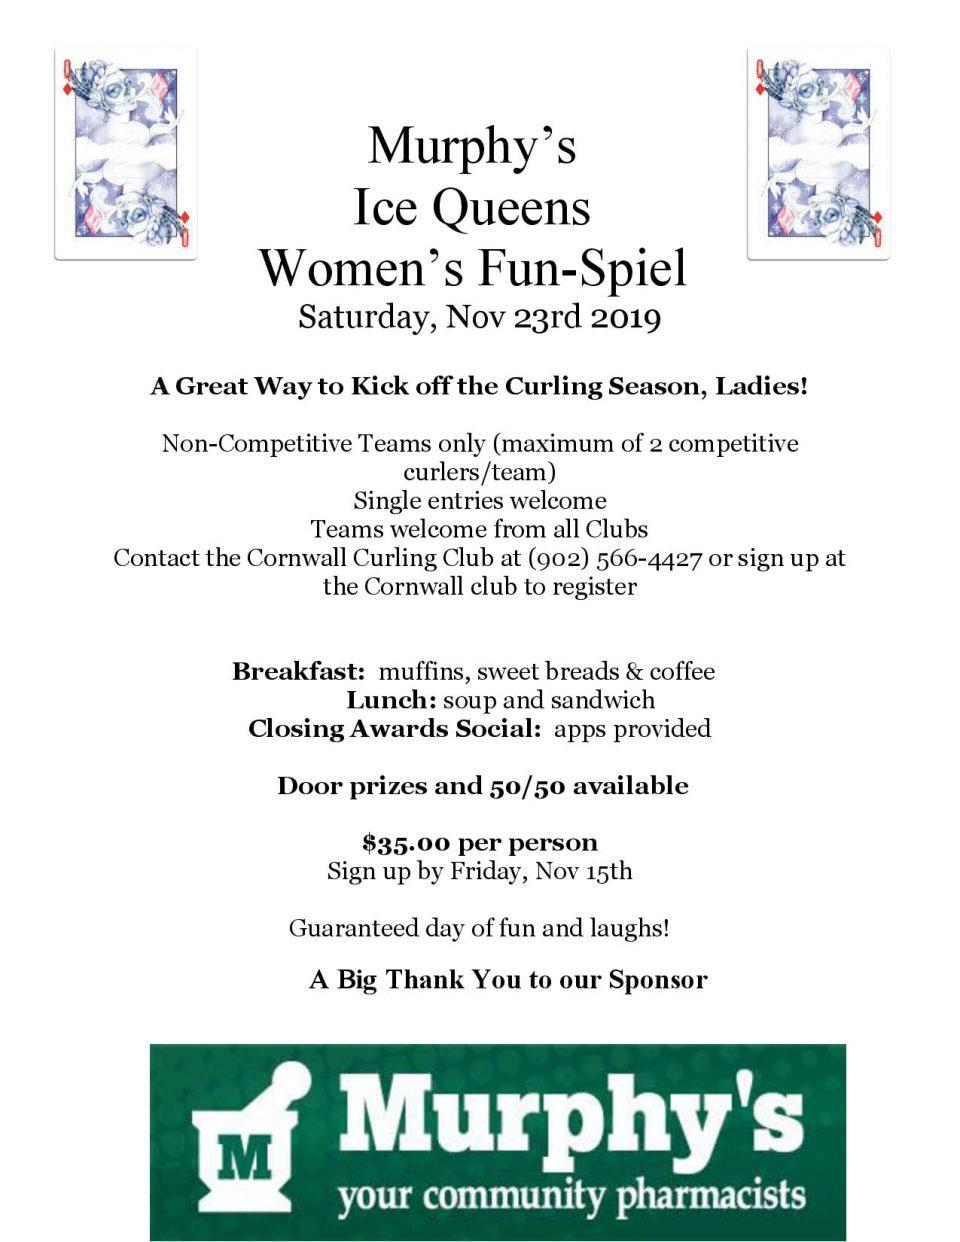 Murphy's Ice Queens Women's Funspiel @ Cornwall Curling Club